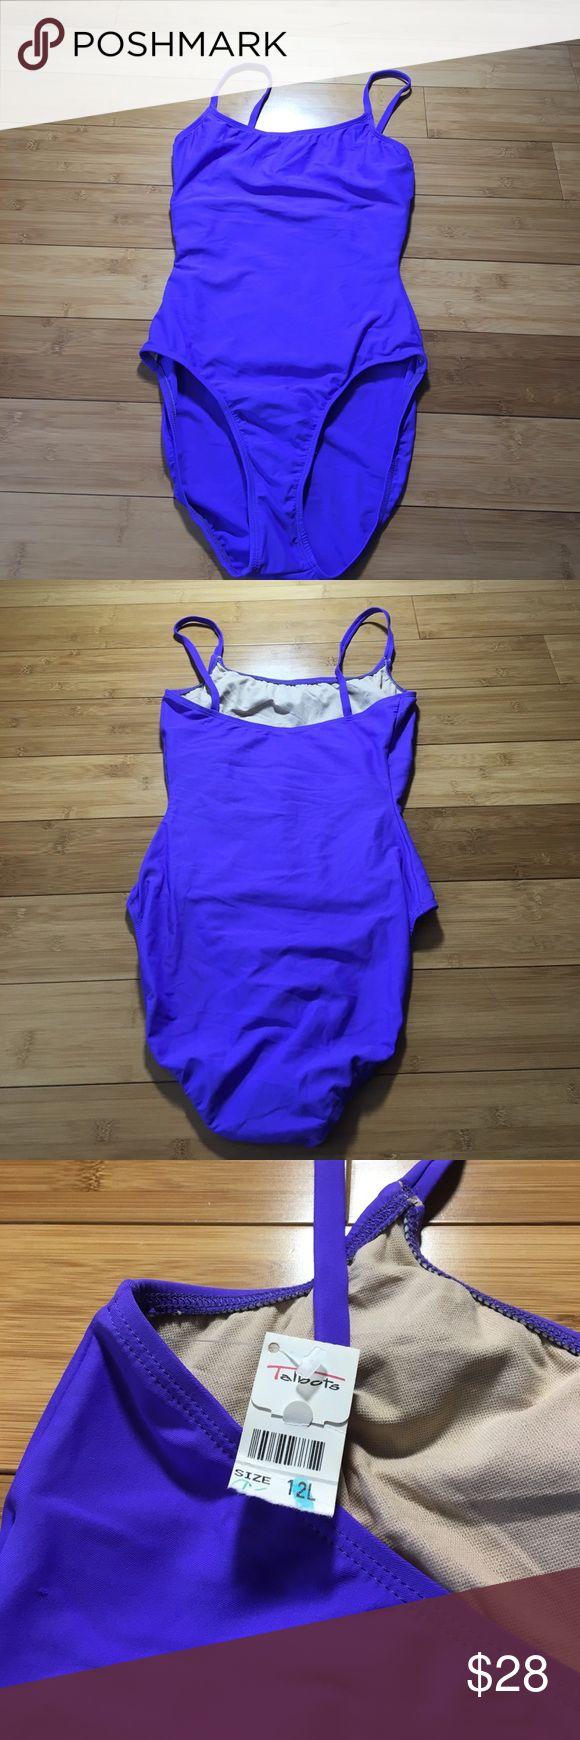 NWT Purple One Piece Bathing Suit Swim Tall 12 L new with tags Talbots swim suit Talbots Swim One Pieces